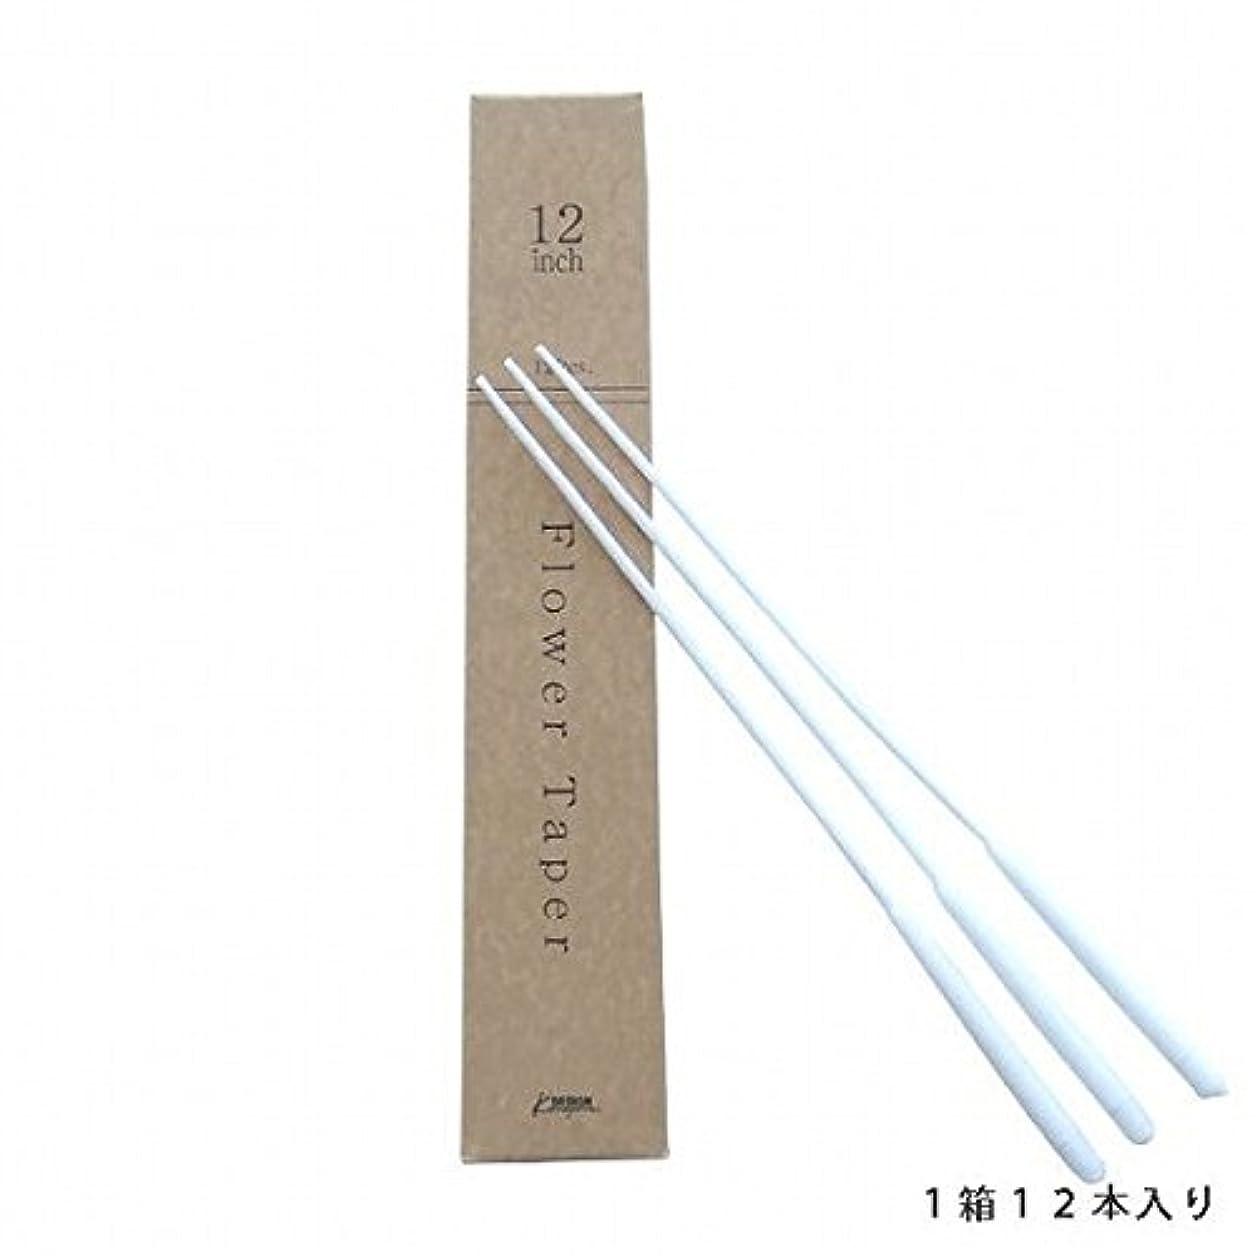 kameyama candle(カメヤマキャンドル) 12インチトーチ用フラワーテーパー12本入 「 ホワイト 」(72339900W)